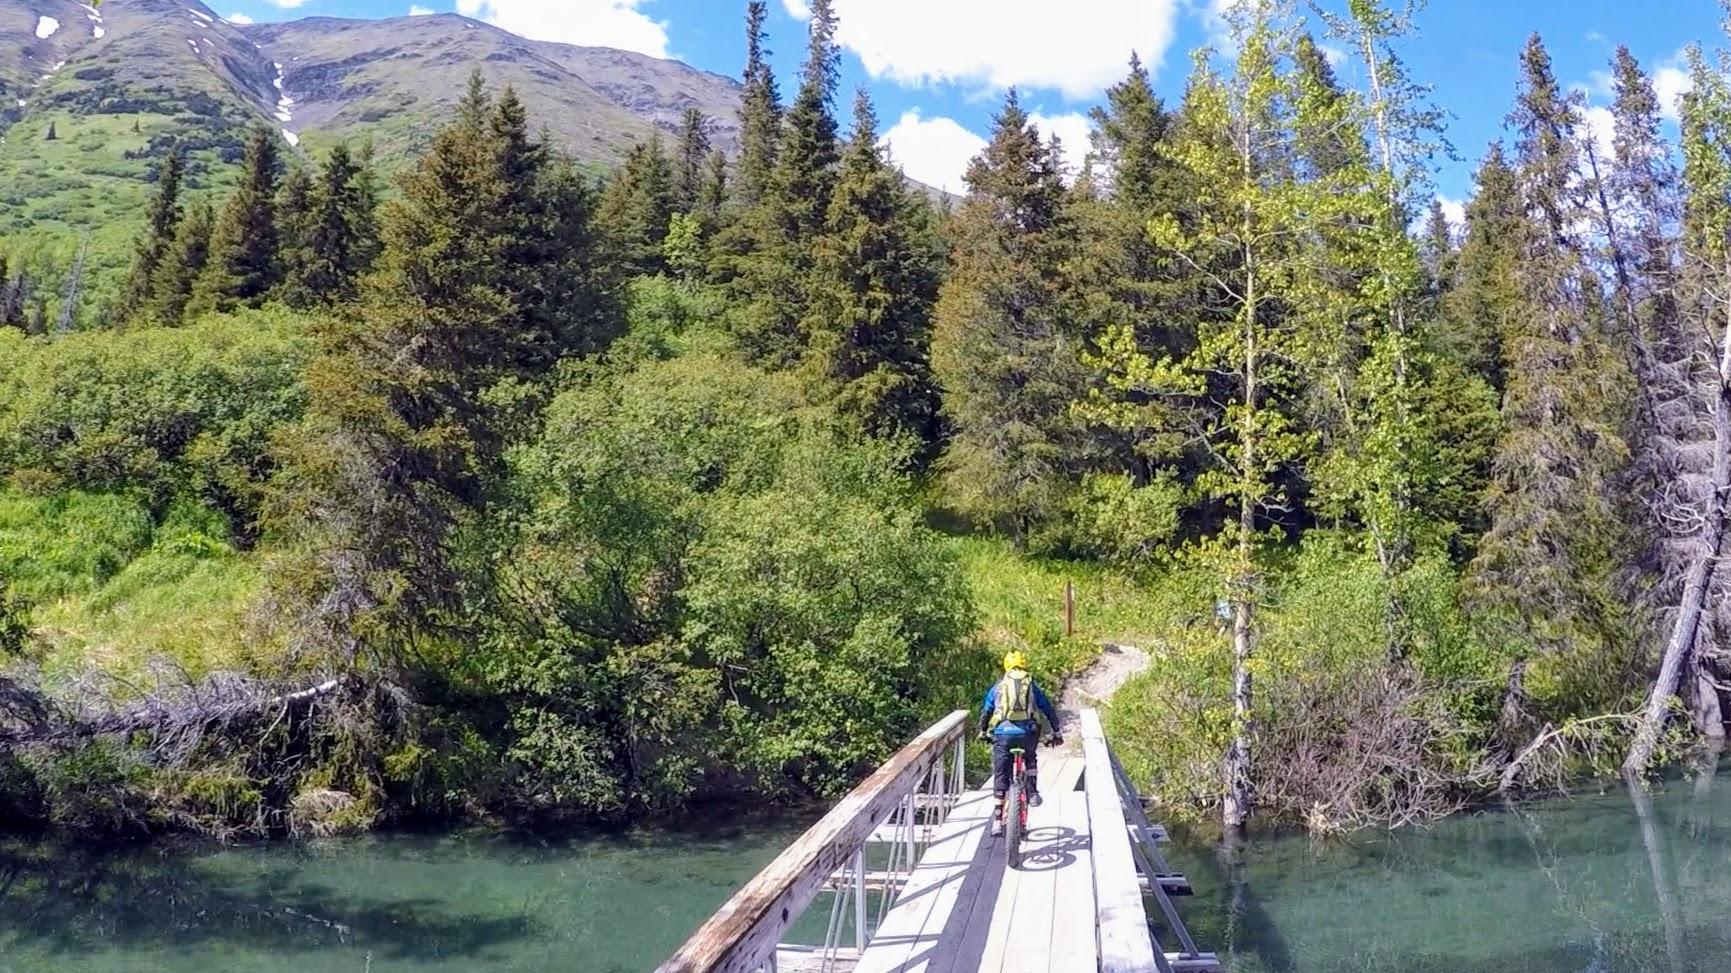 Mountain Bike tour in Kenai Penisula Cooper Landing Seward